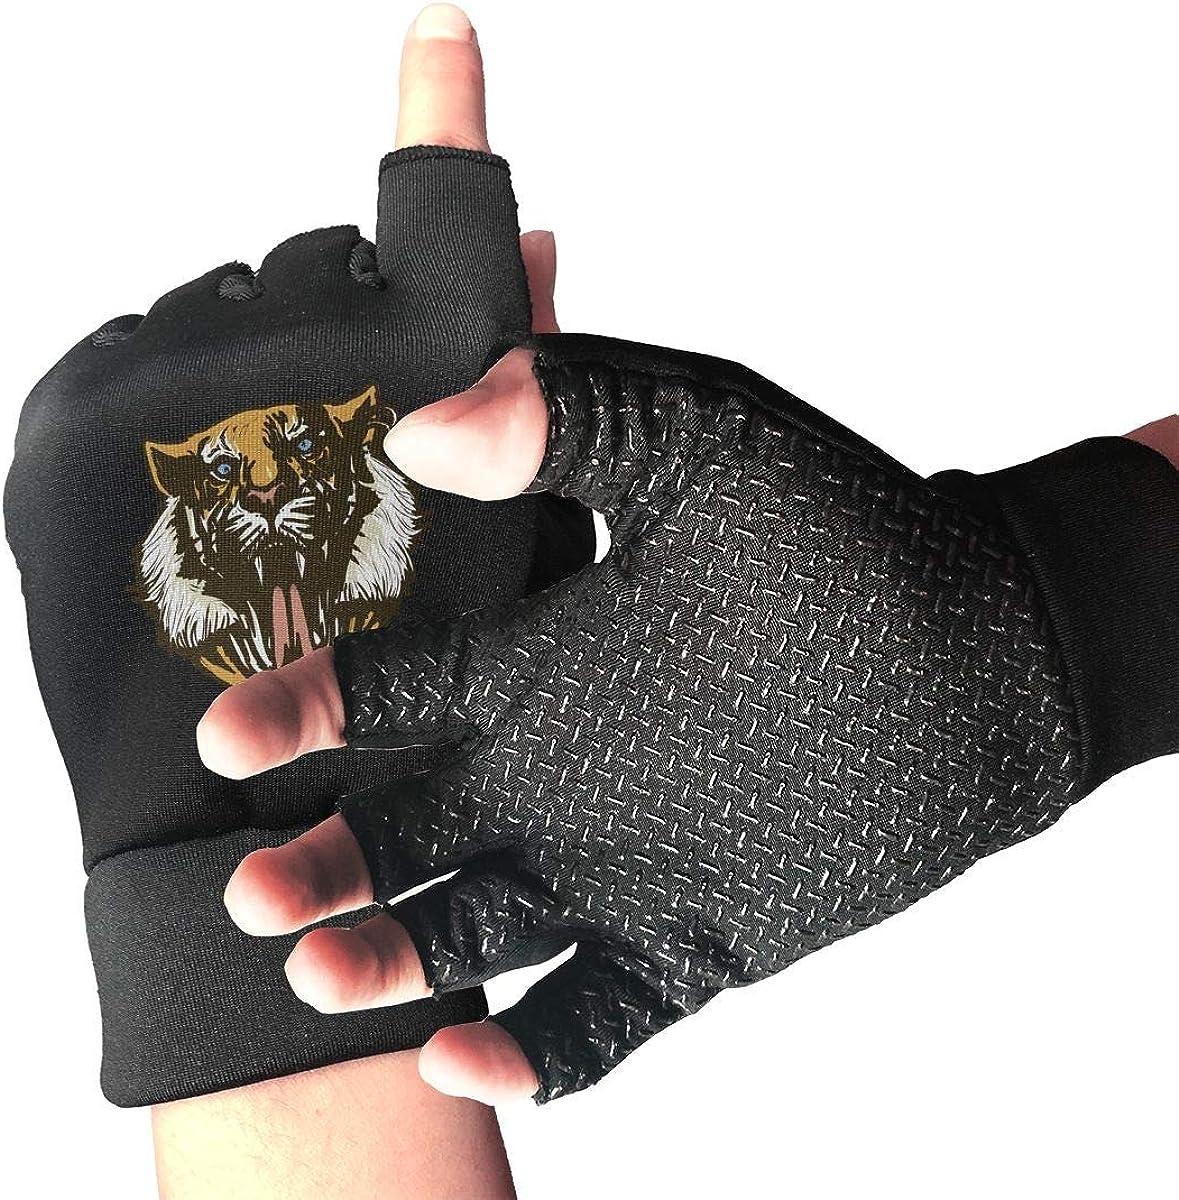 Gloves Angry Tiger Fingerless Gloves Short Touchscreen Gloves Winter Motorcycle Biker Mitten